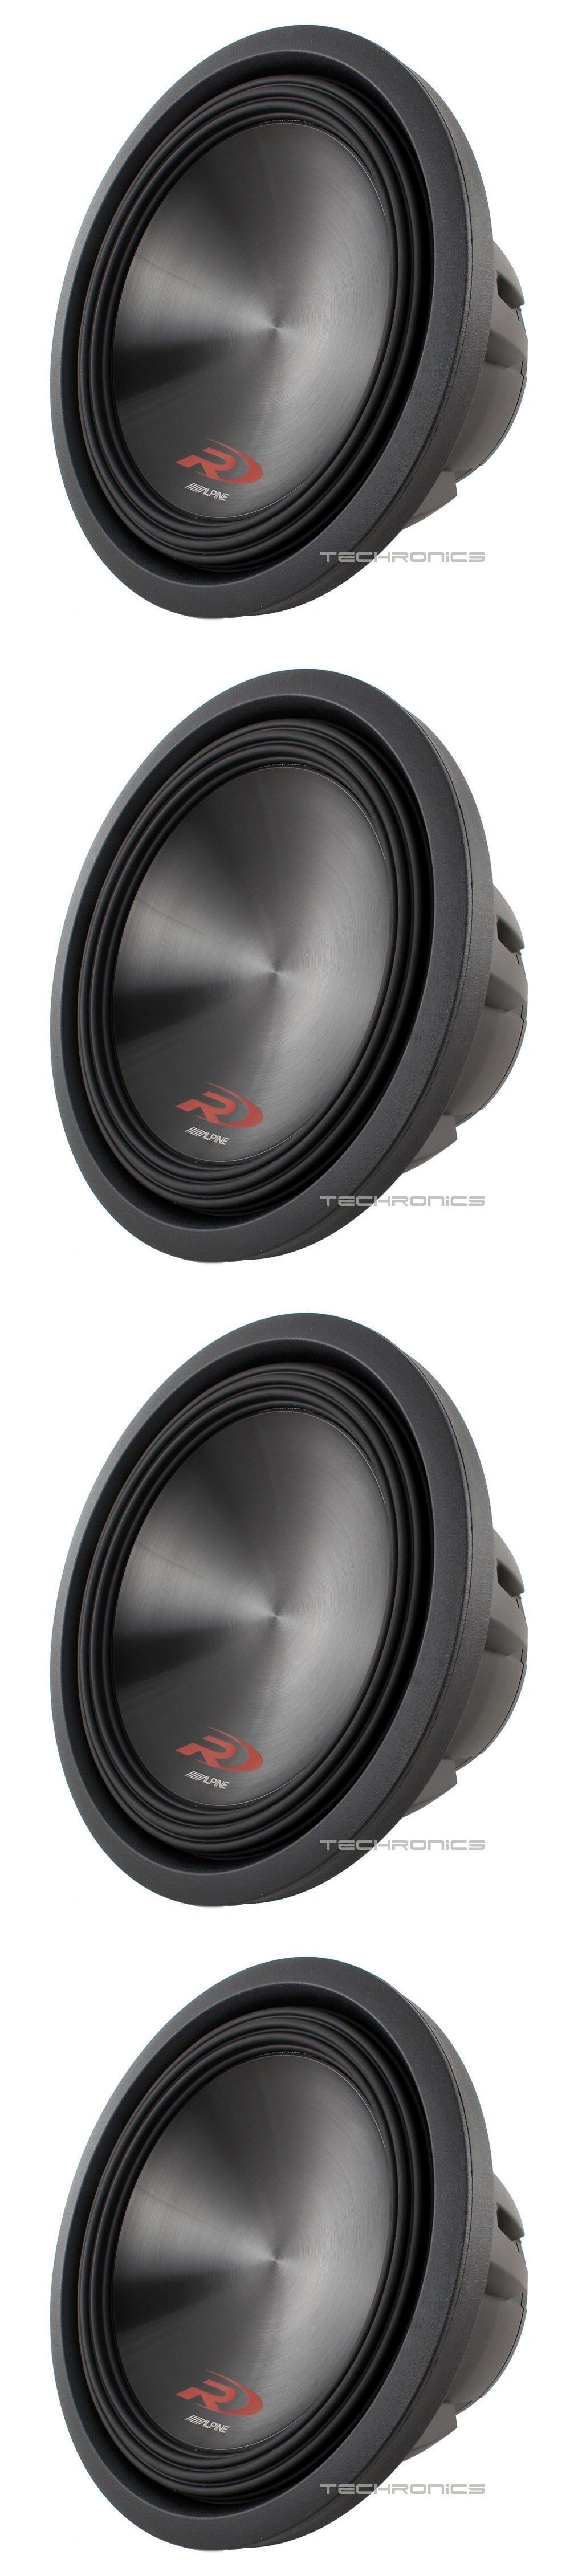 Soundstream T5 122 Tarantula T5 2000 Watts 12 Dual 2 Ohm Car Audio Subwoofer